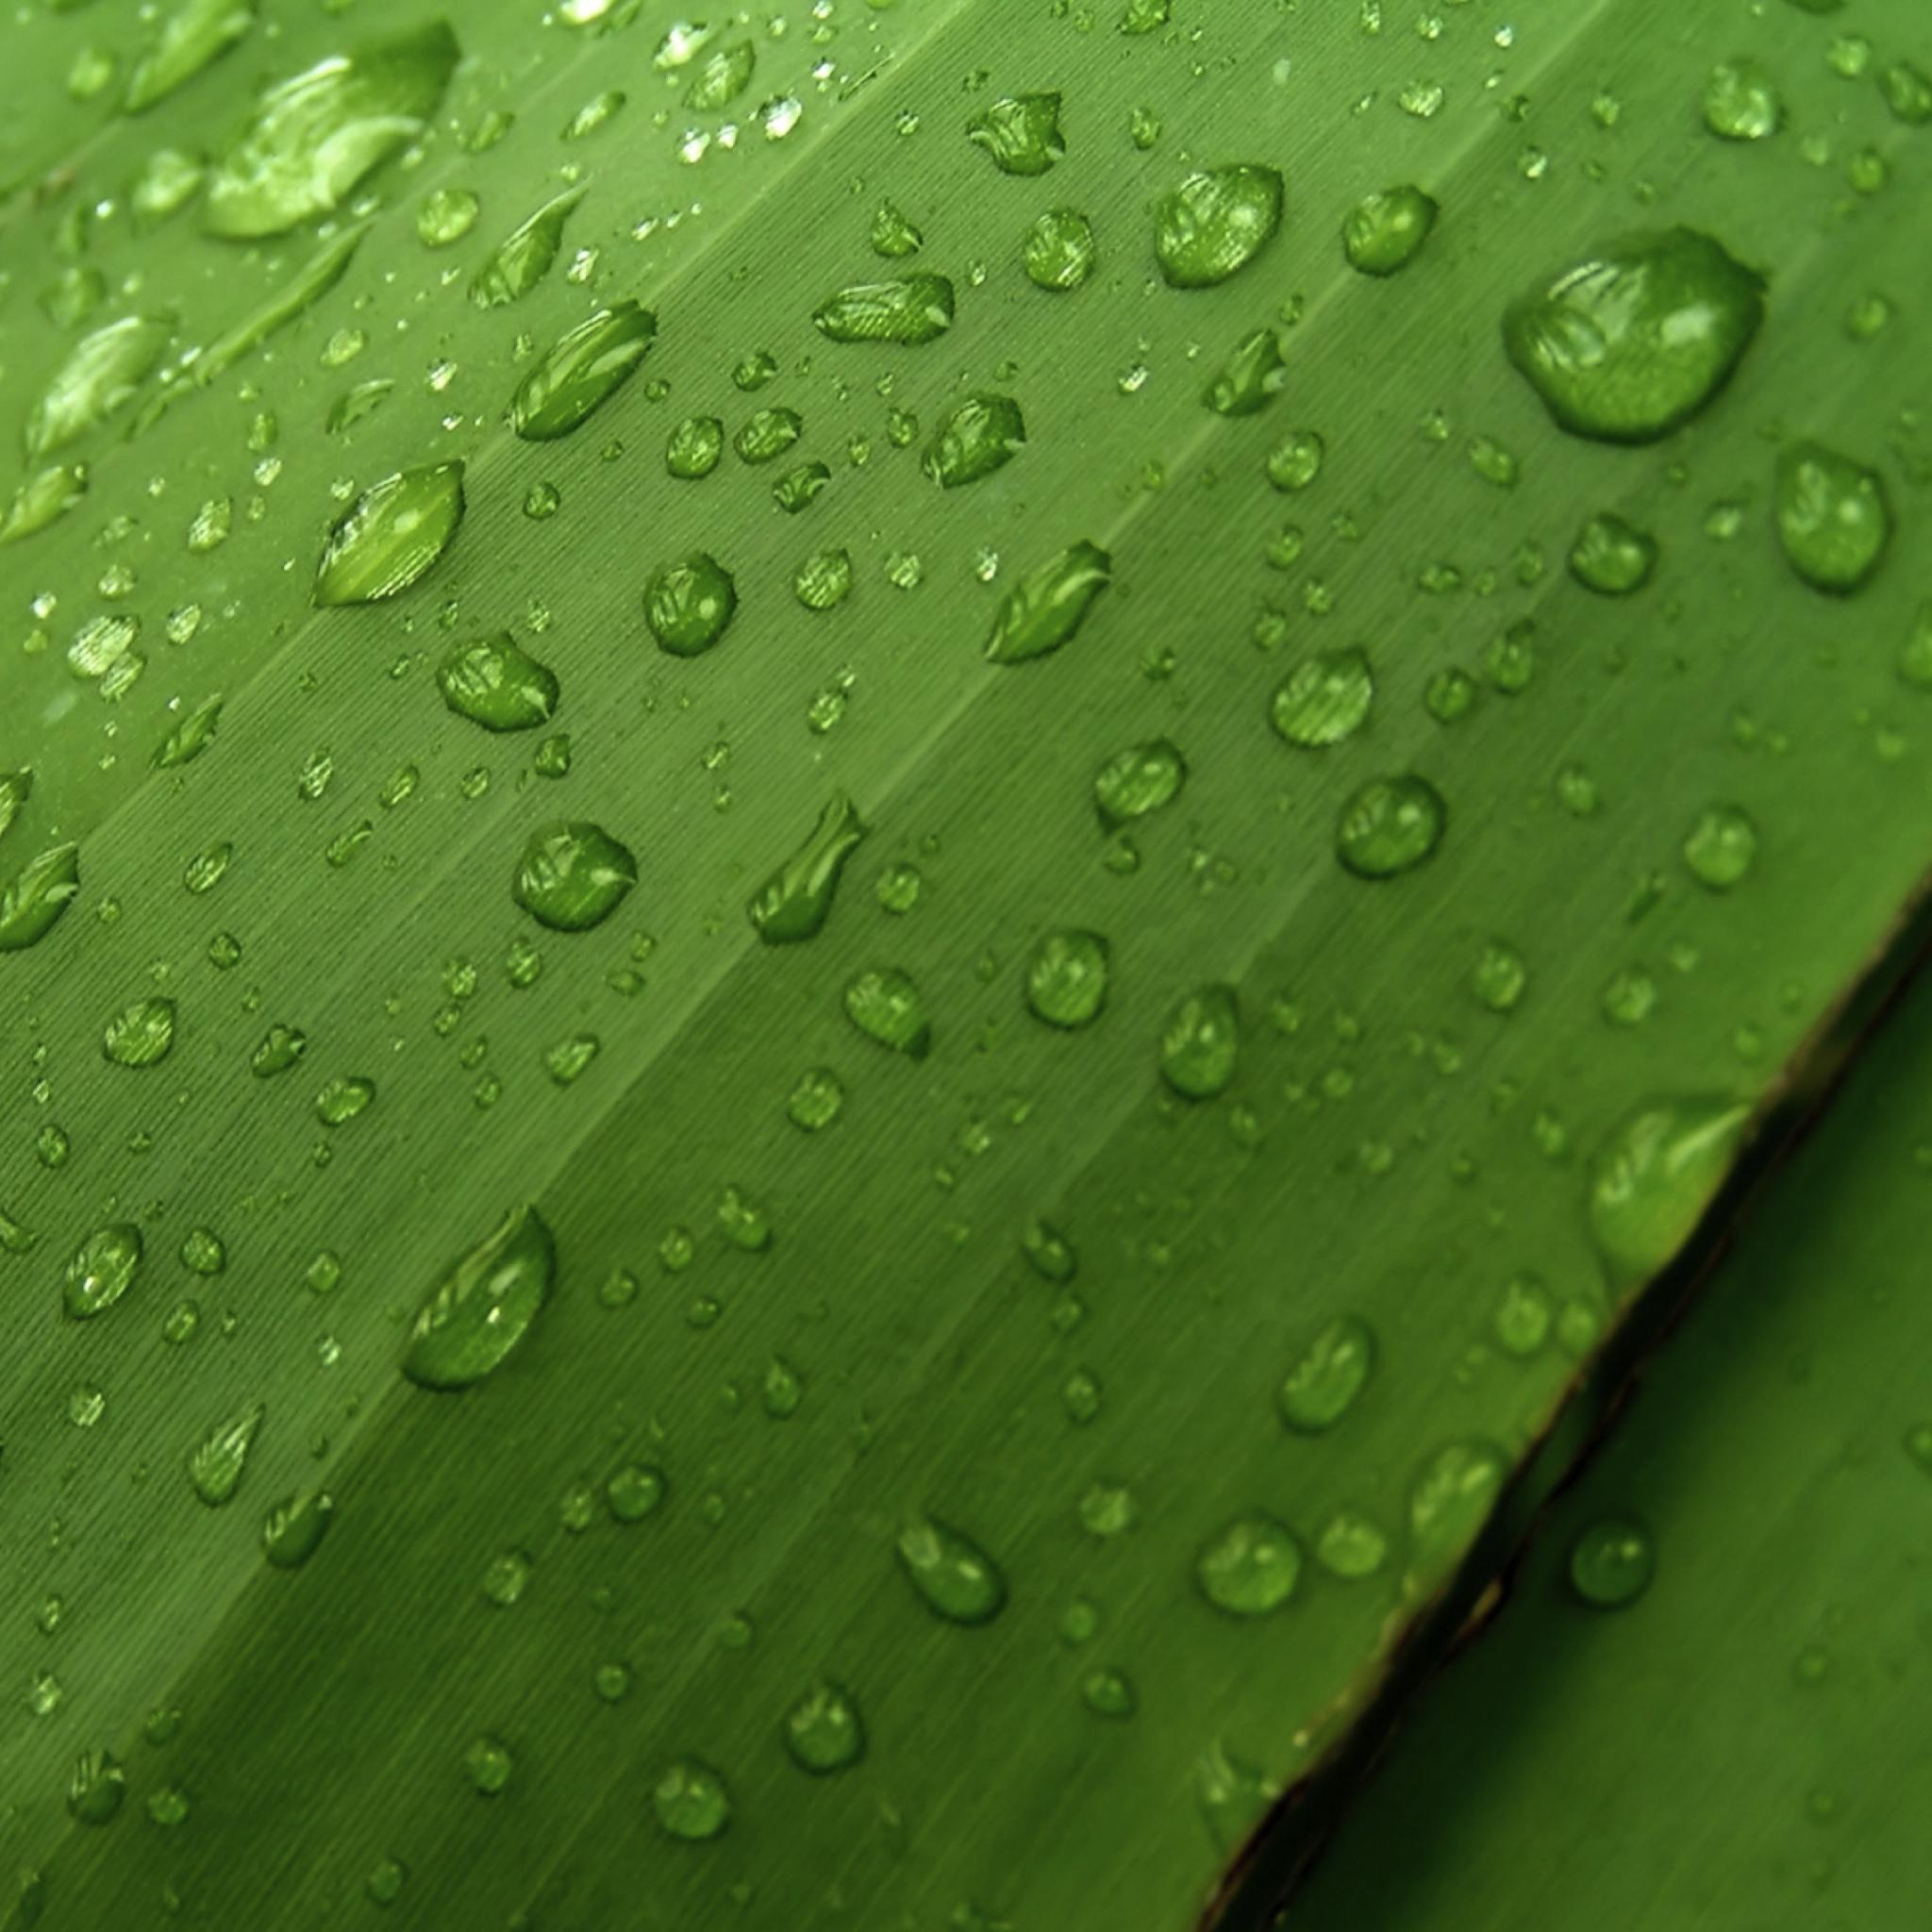 Drop of Water 3W iPad.jpg  Drop of Water   iPad